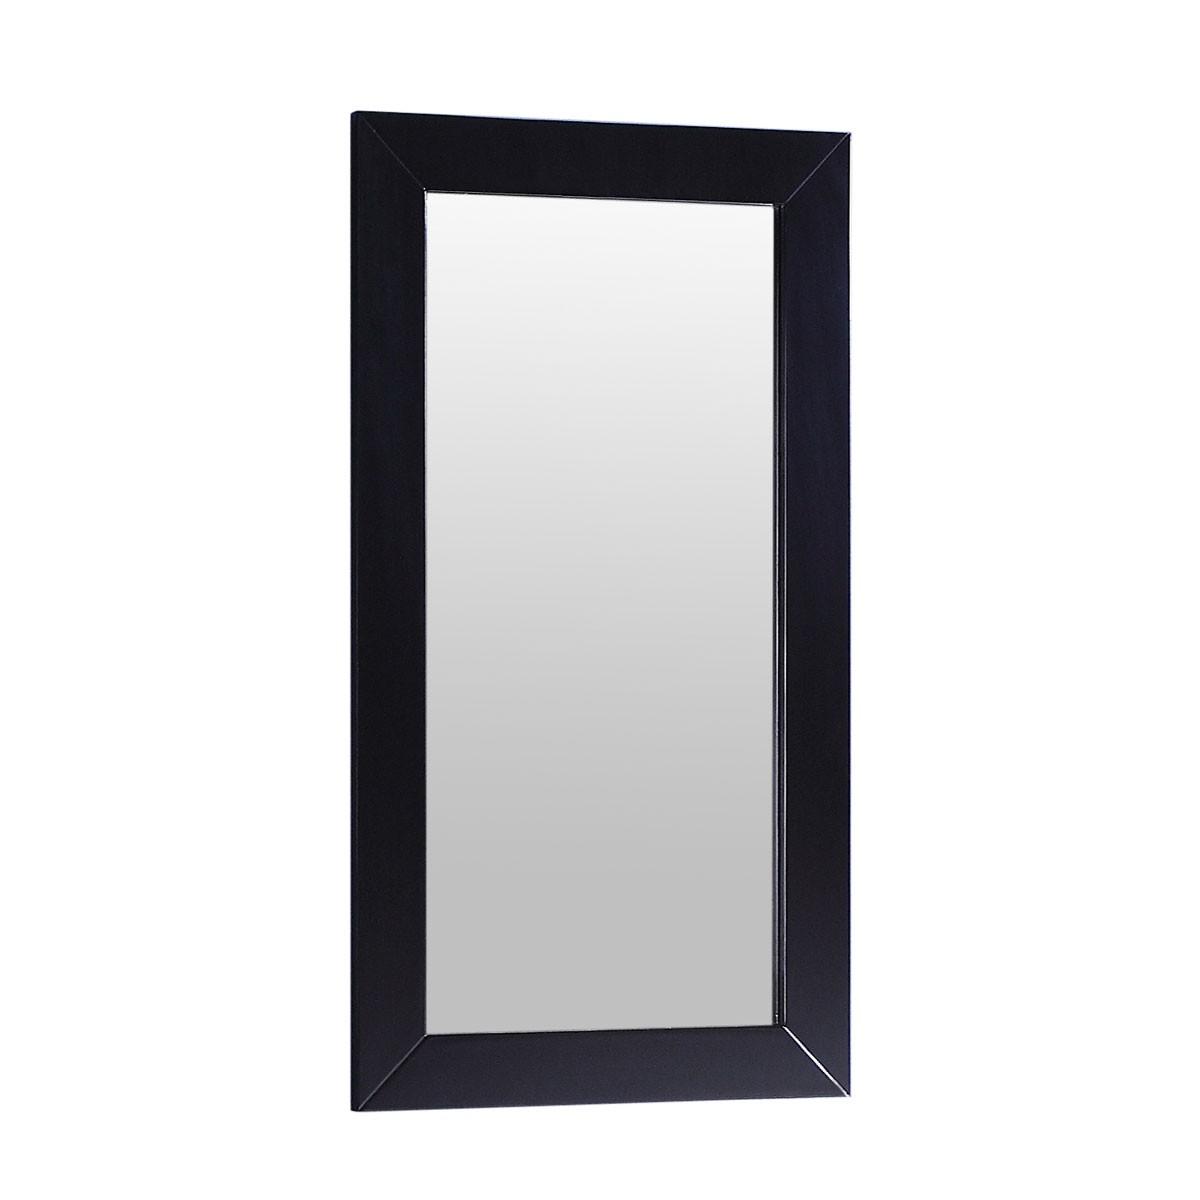 18 x 28 In. Mirror with Espresso Frame (DK-T9188-M)